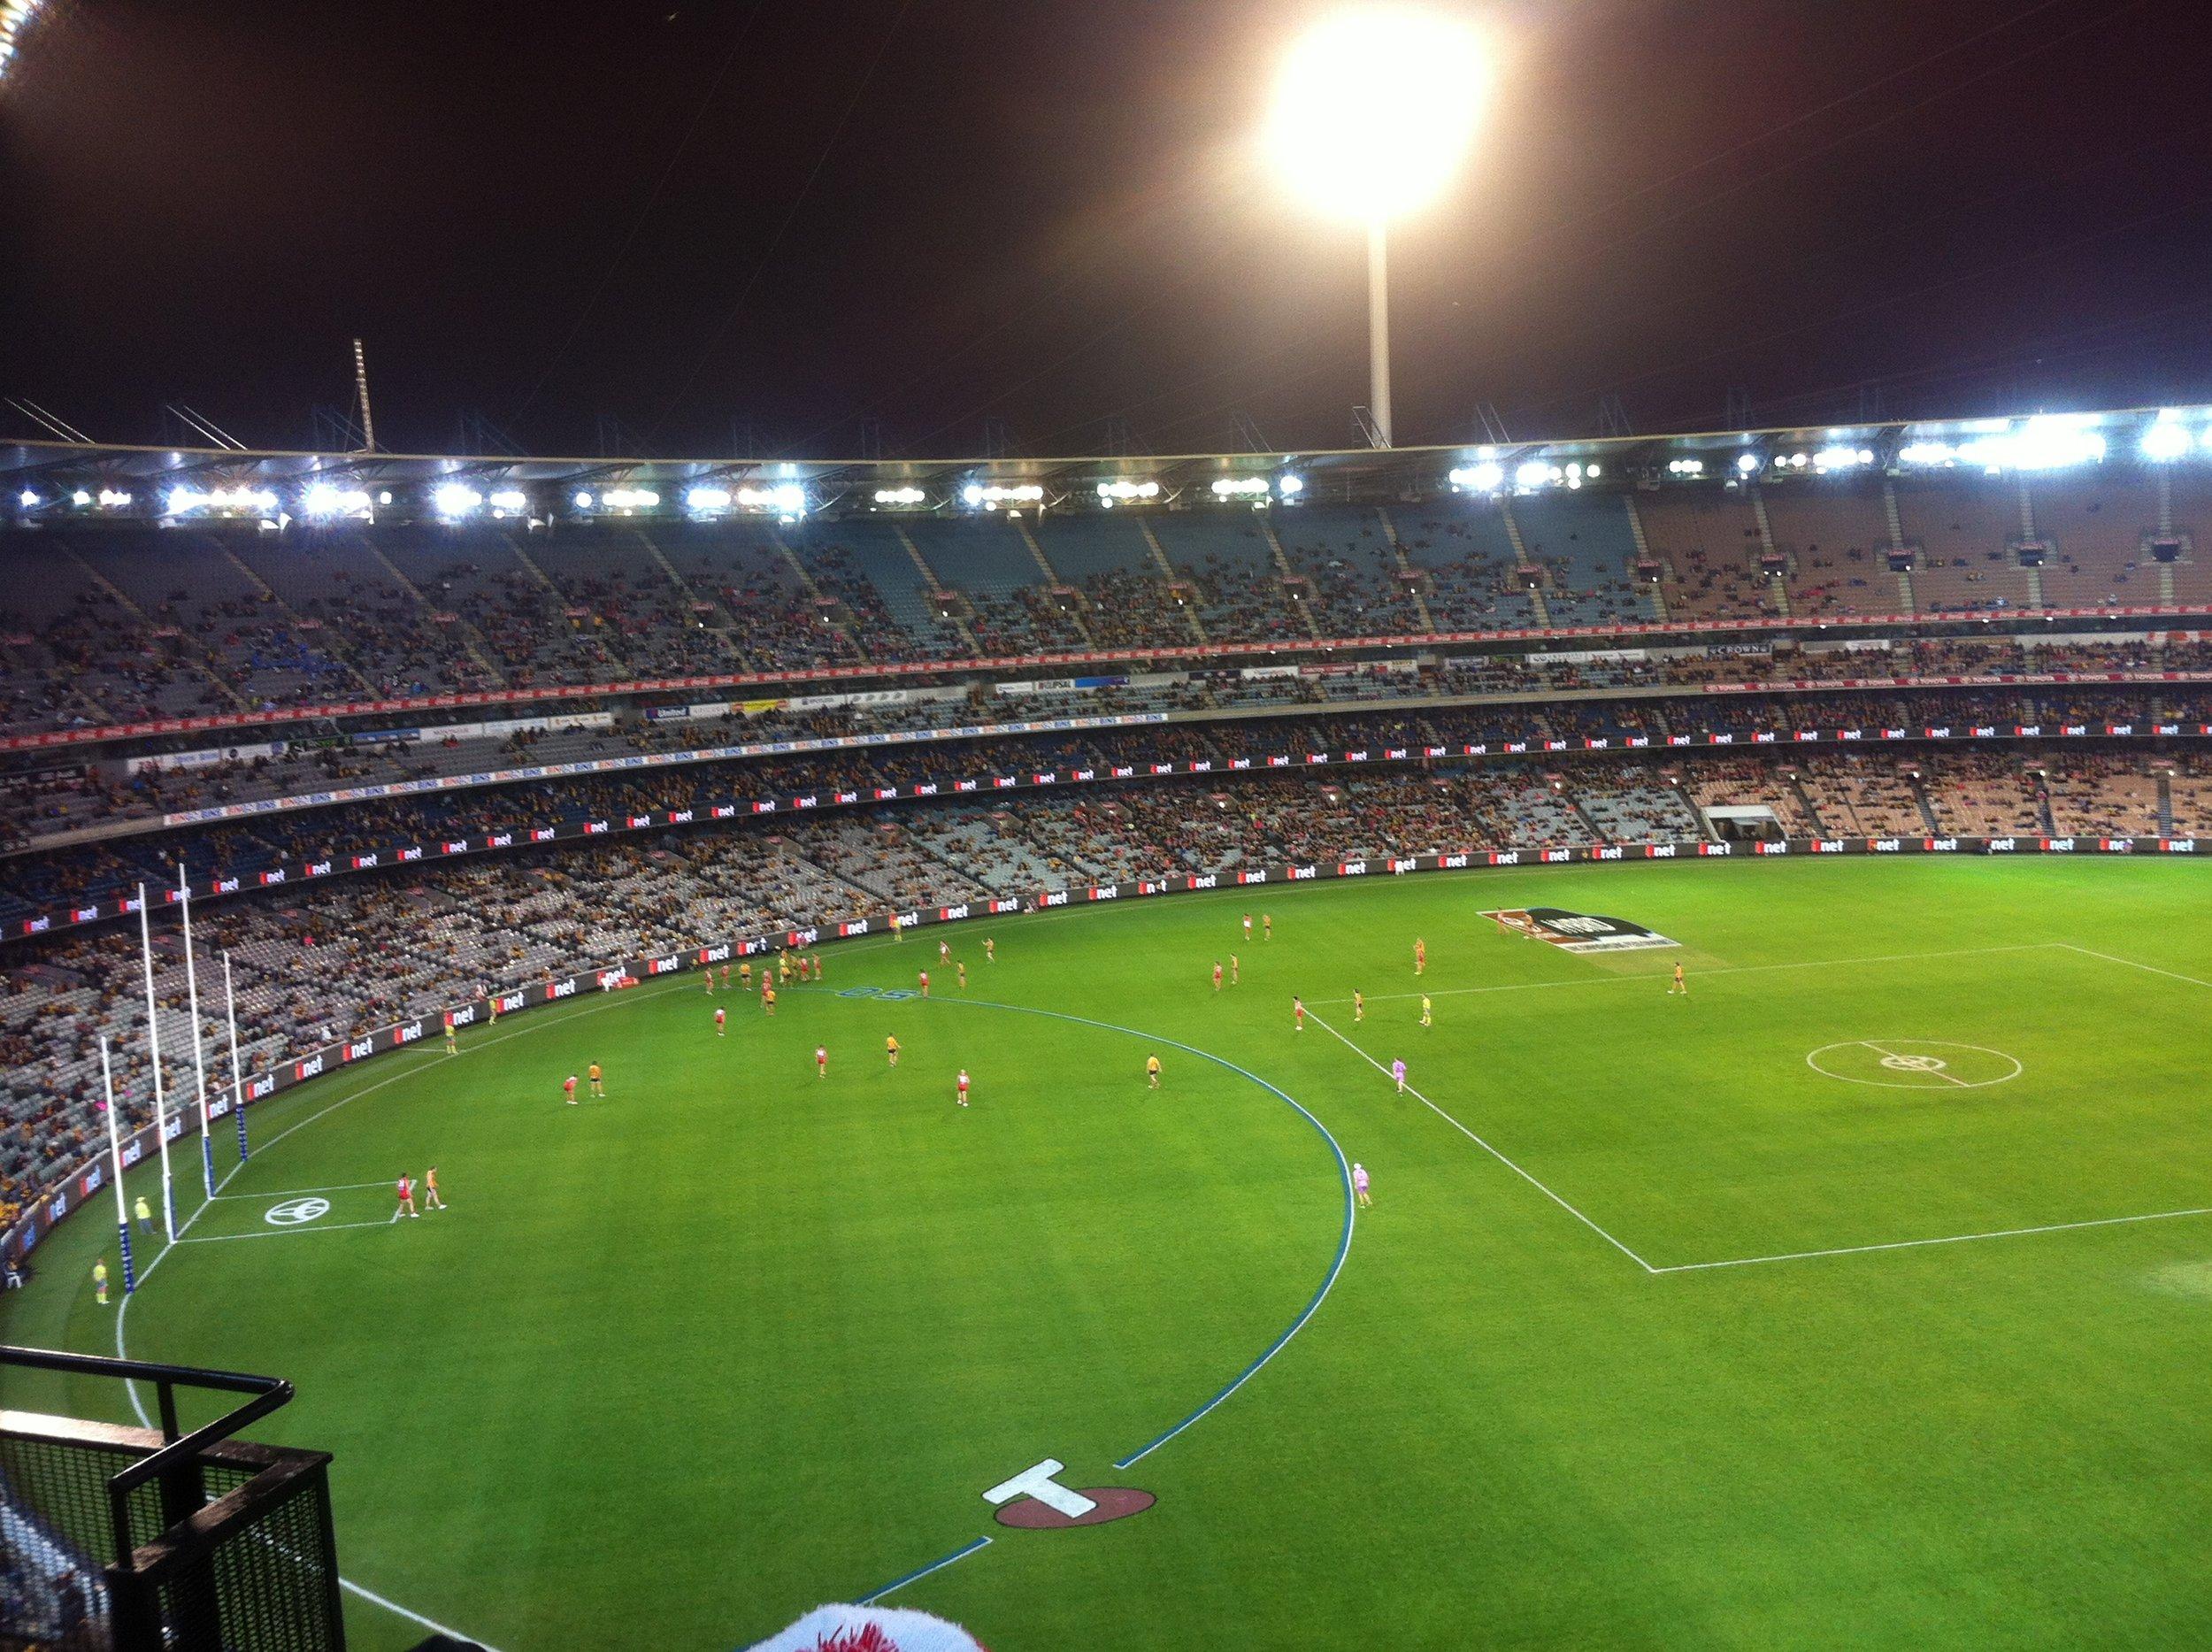 Melbourne's iconic sports stadium, the MCG (Melbourne Cricket Ground).